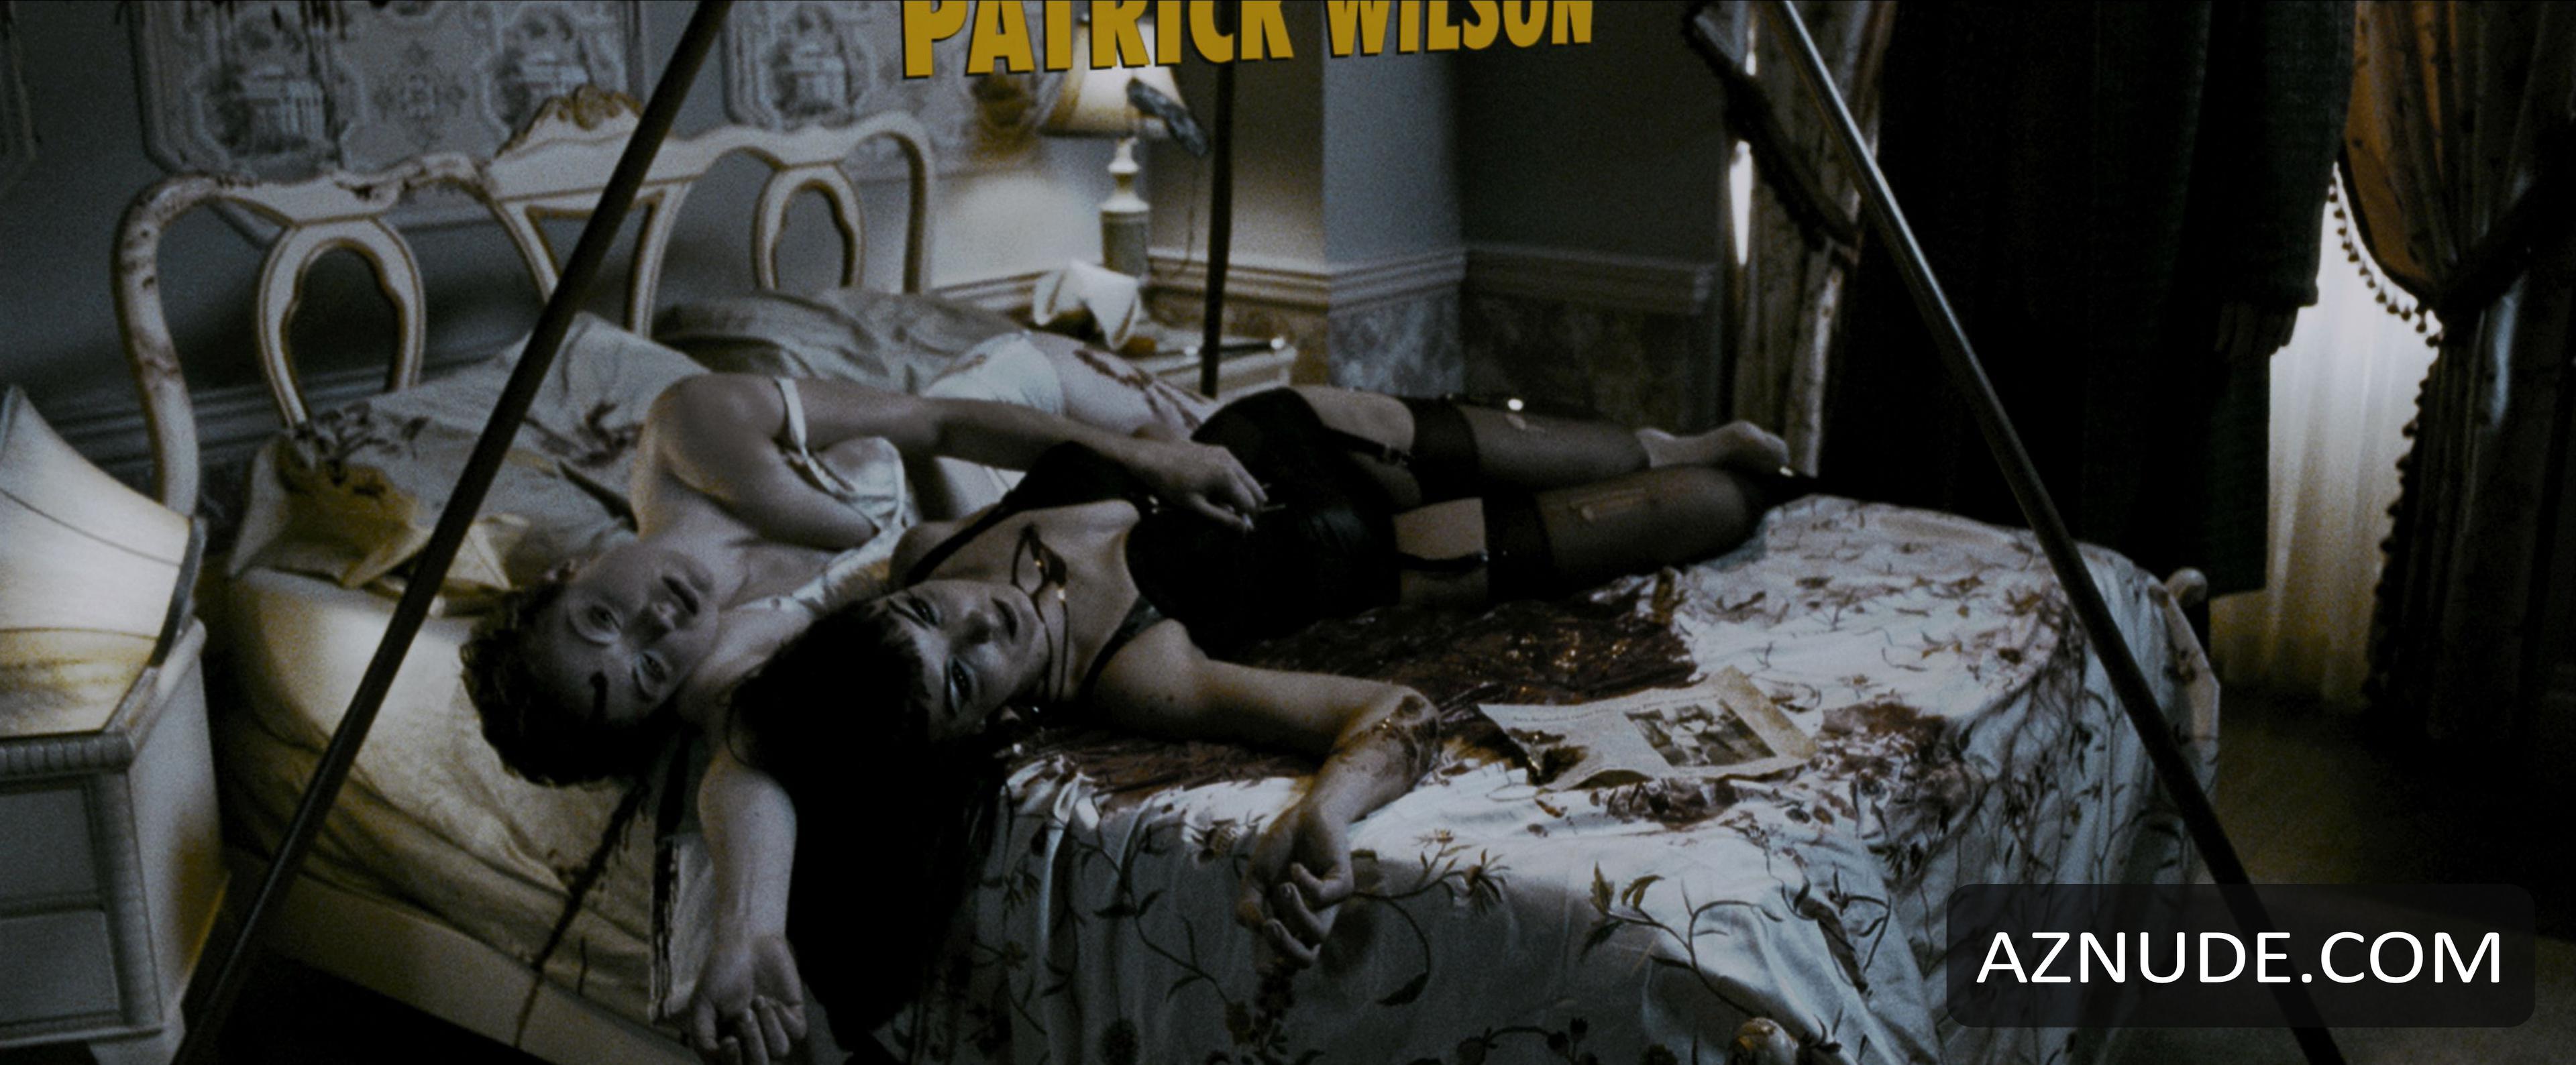 from Princeton malin akerman nude photo